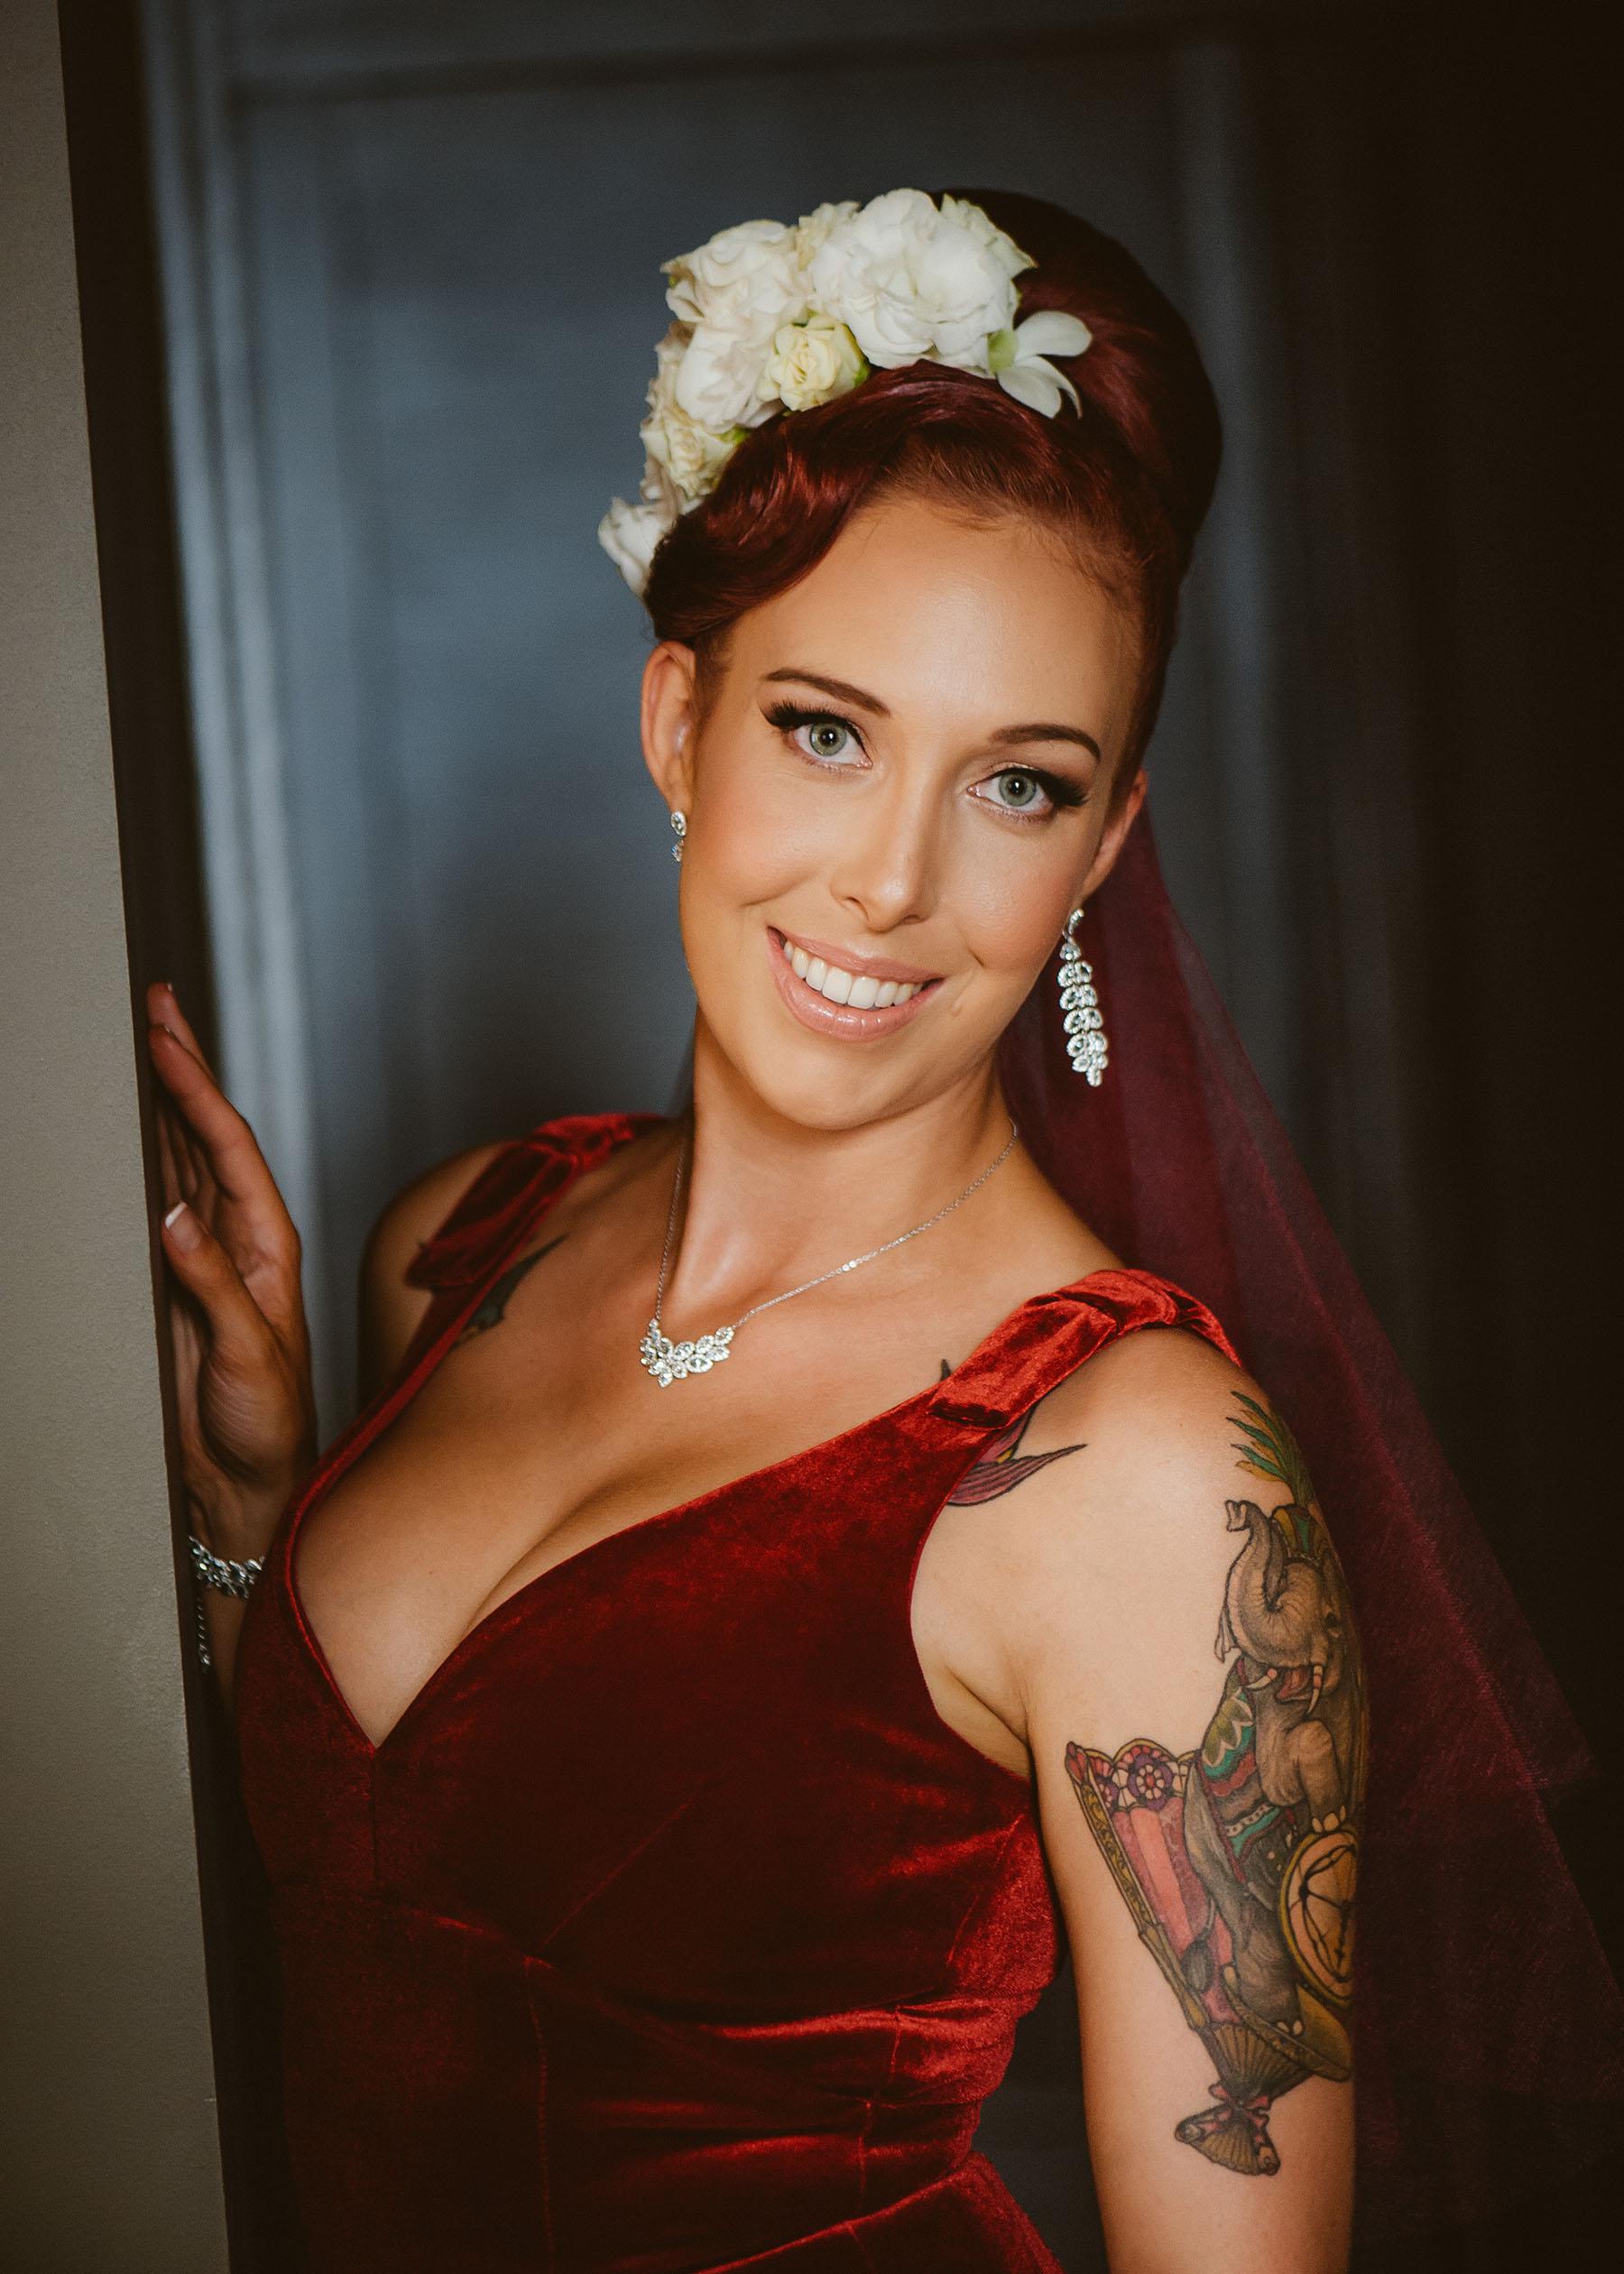 Marryme_wedding_photography_dorrigo_bellingen_photographer_11.jpg